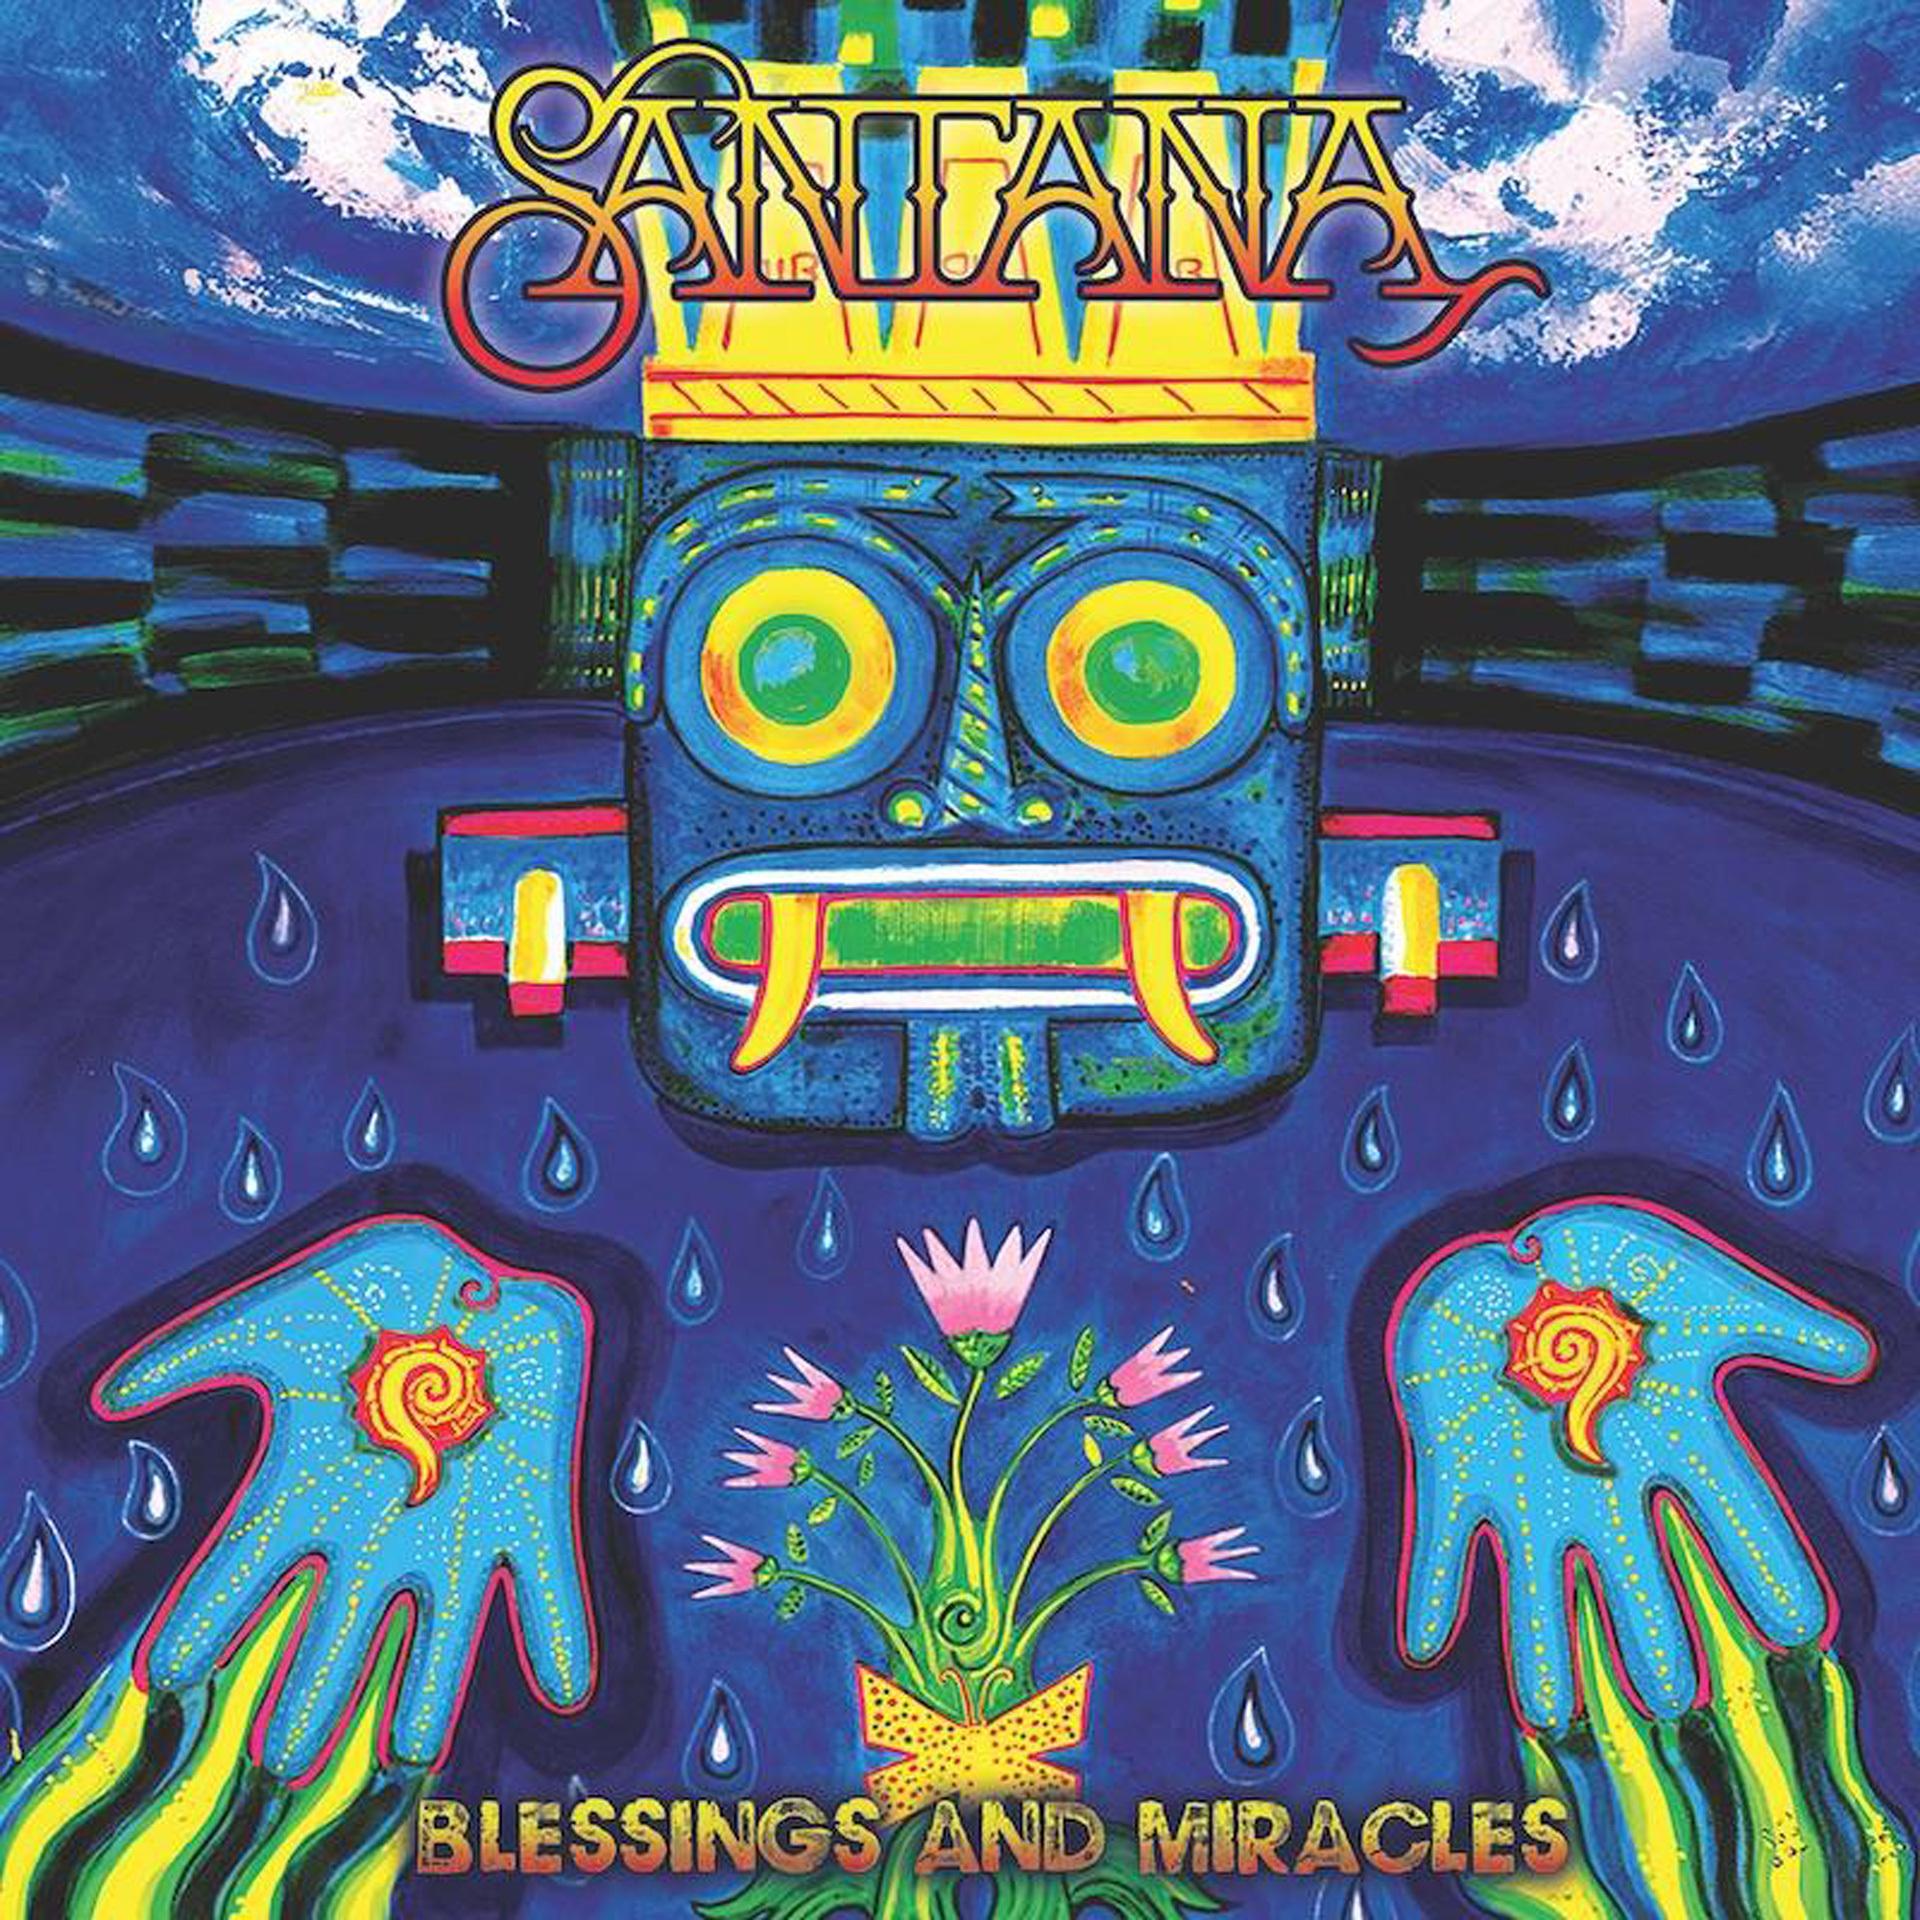 Carlos Santana album artwork blessings and miracles